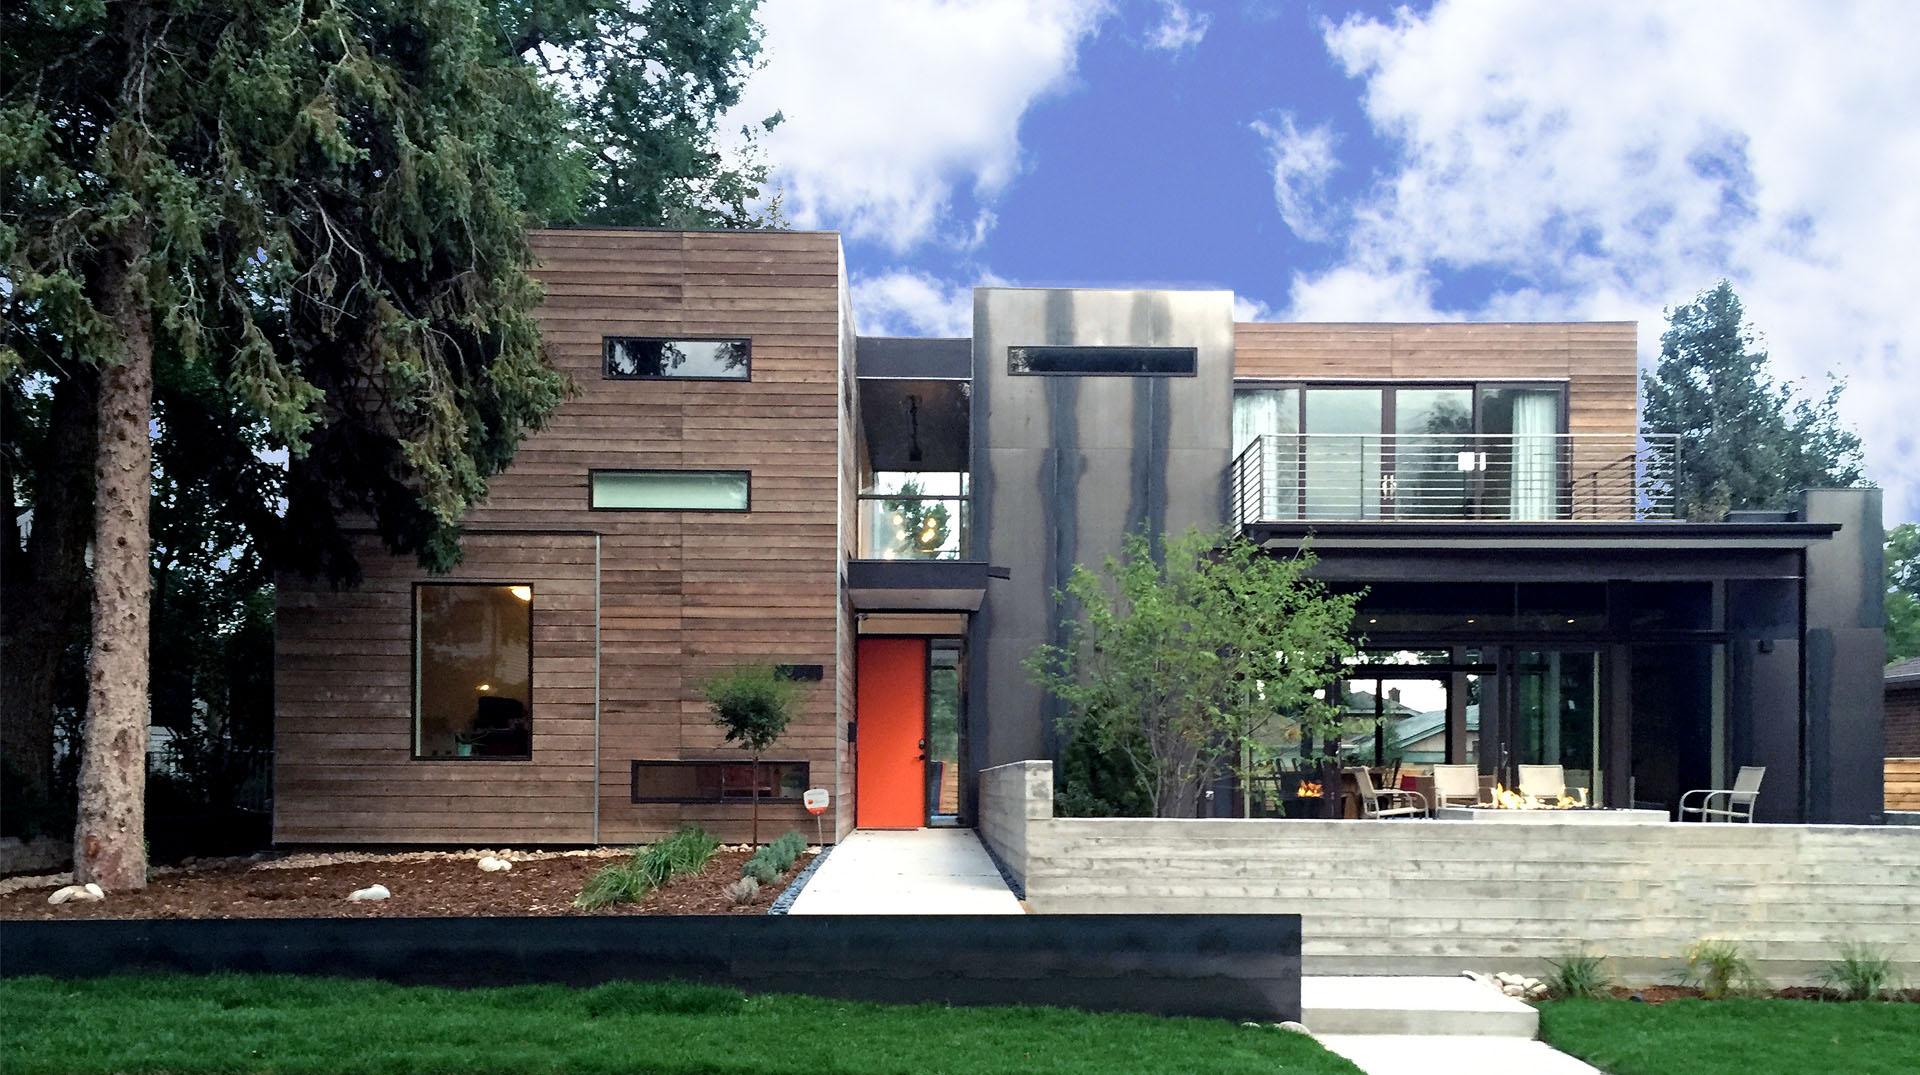 Best Kitchen Gallery: Architectural And Modern Landscaping In Washington Park Denver of Modern Denver Homes  on rachelxblog.com